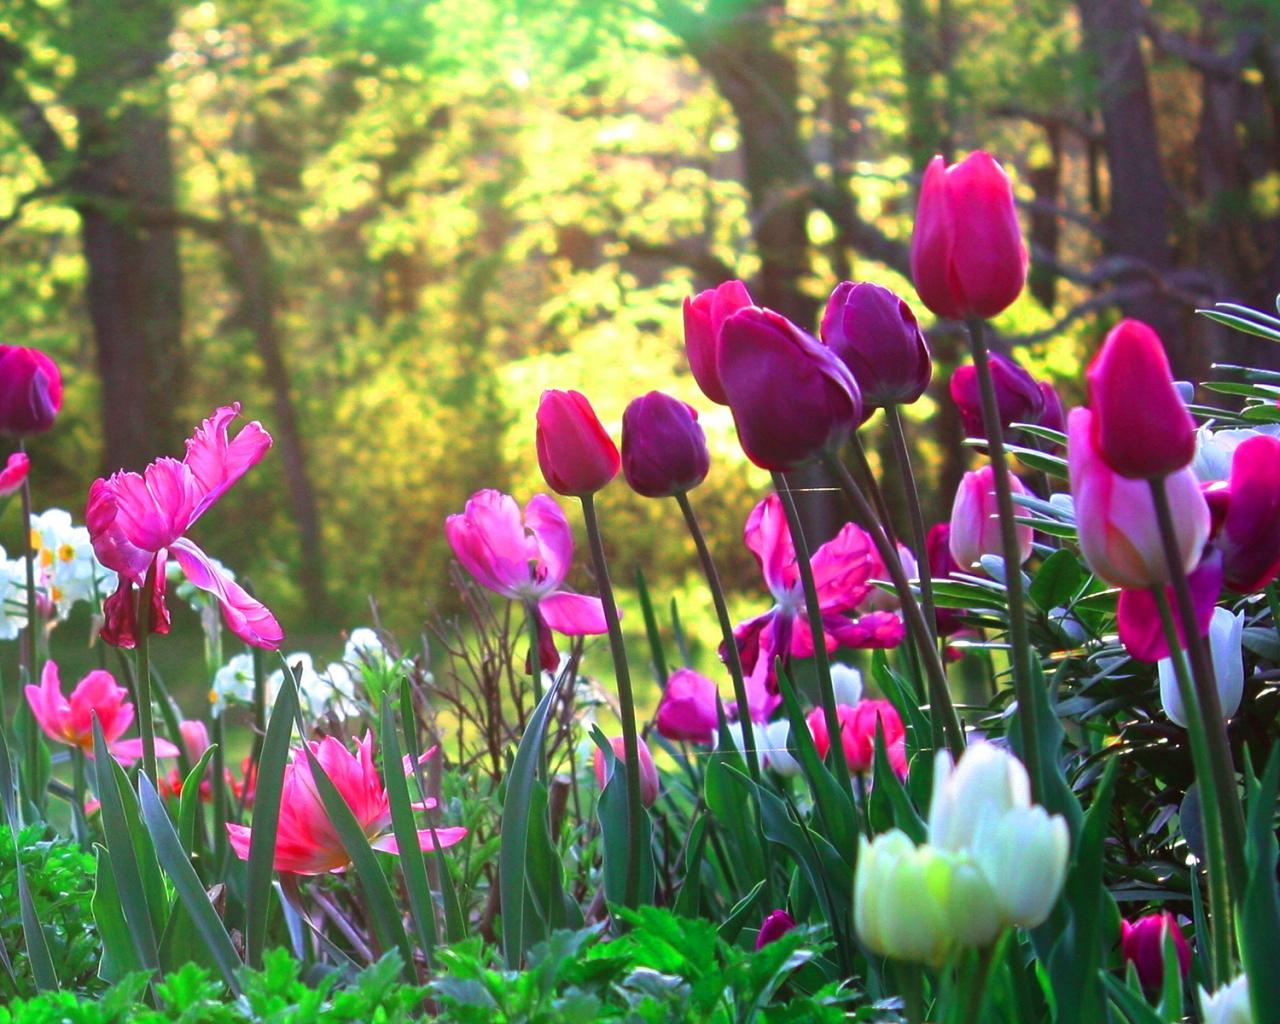 tulipes acheter choisir planter et entretenir facilement. Black Bedroom Furniture Sets. Home Design Ideas